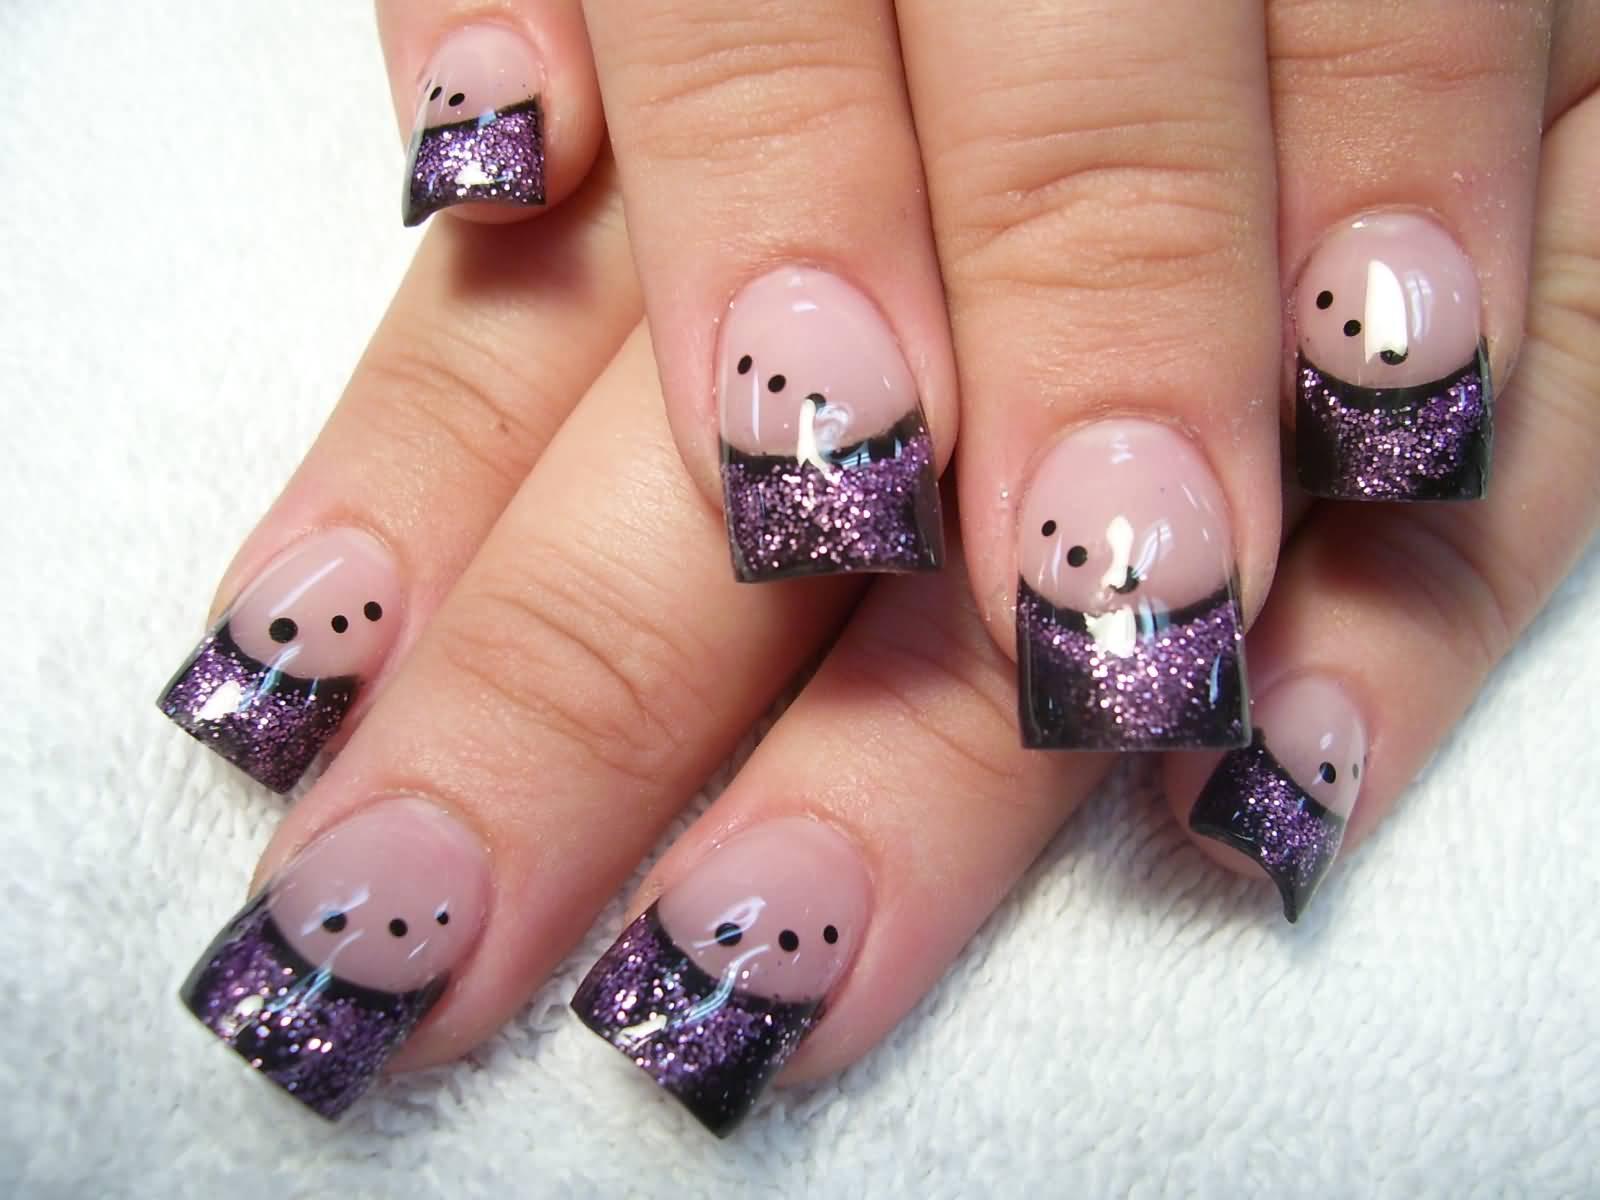 Purple Silver And White Nail Art - NailArts Ideas